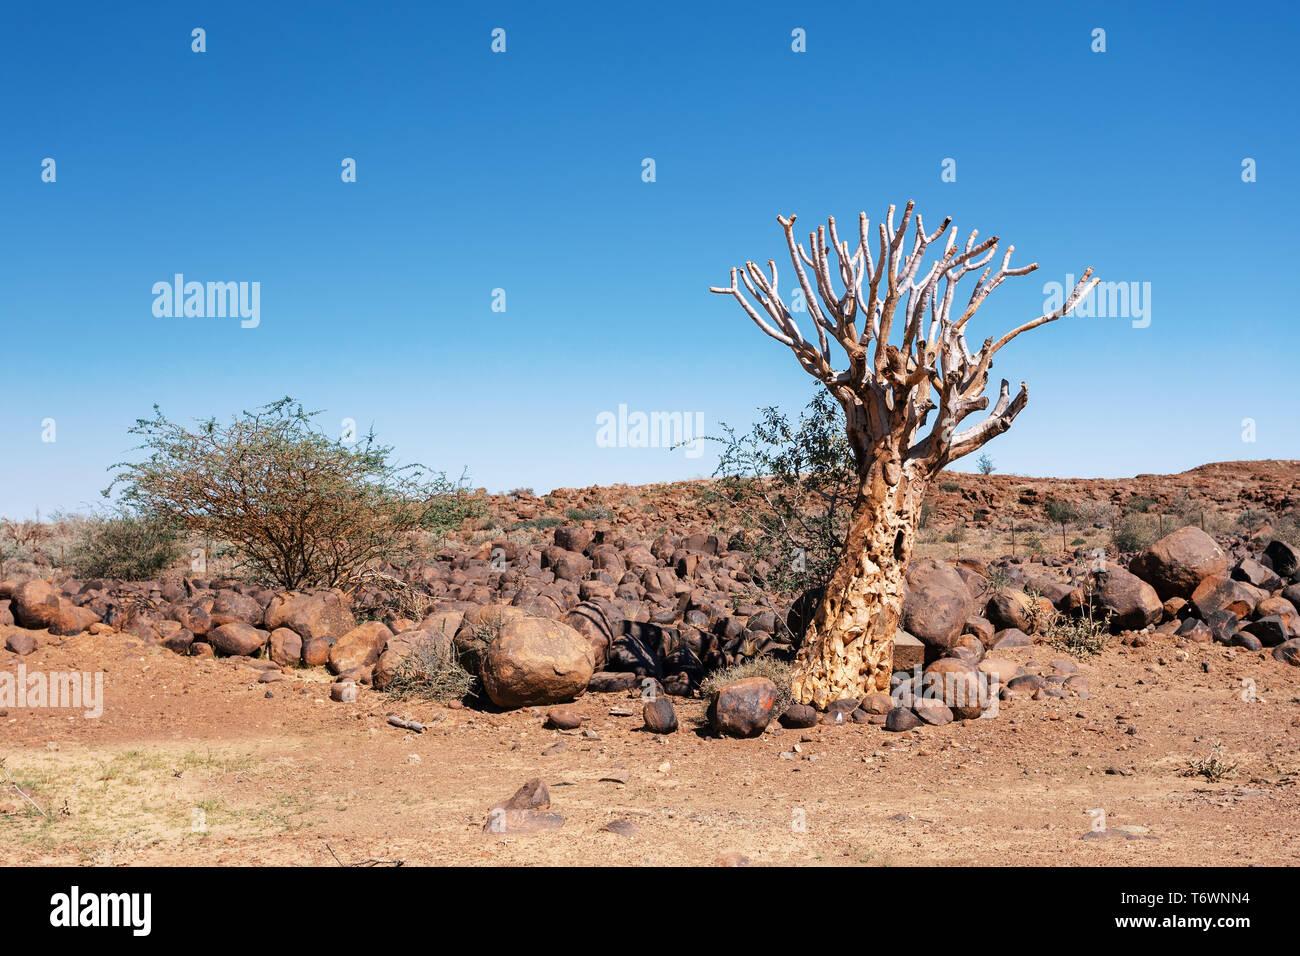 Aloidendron dichotomum, aloe tree, Namibia wilderness Stock Photo